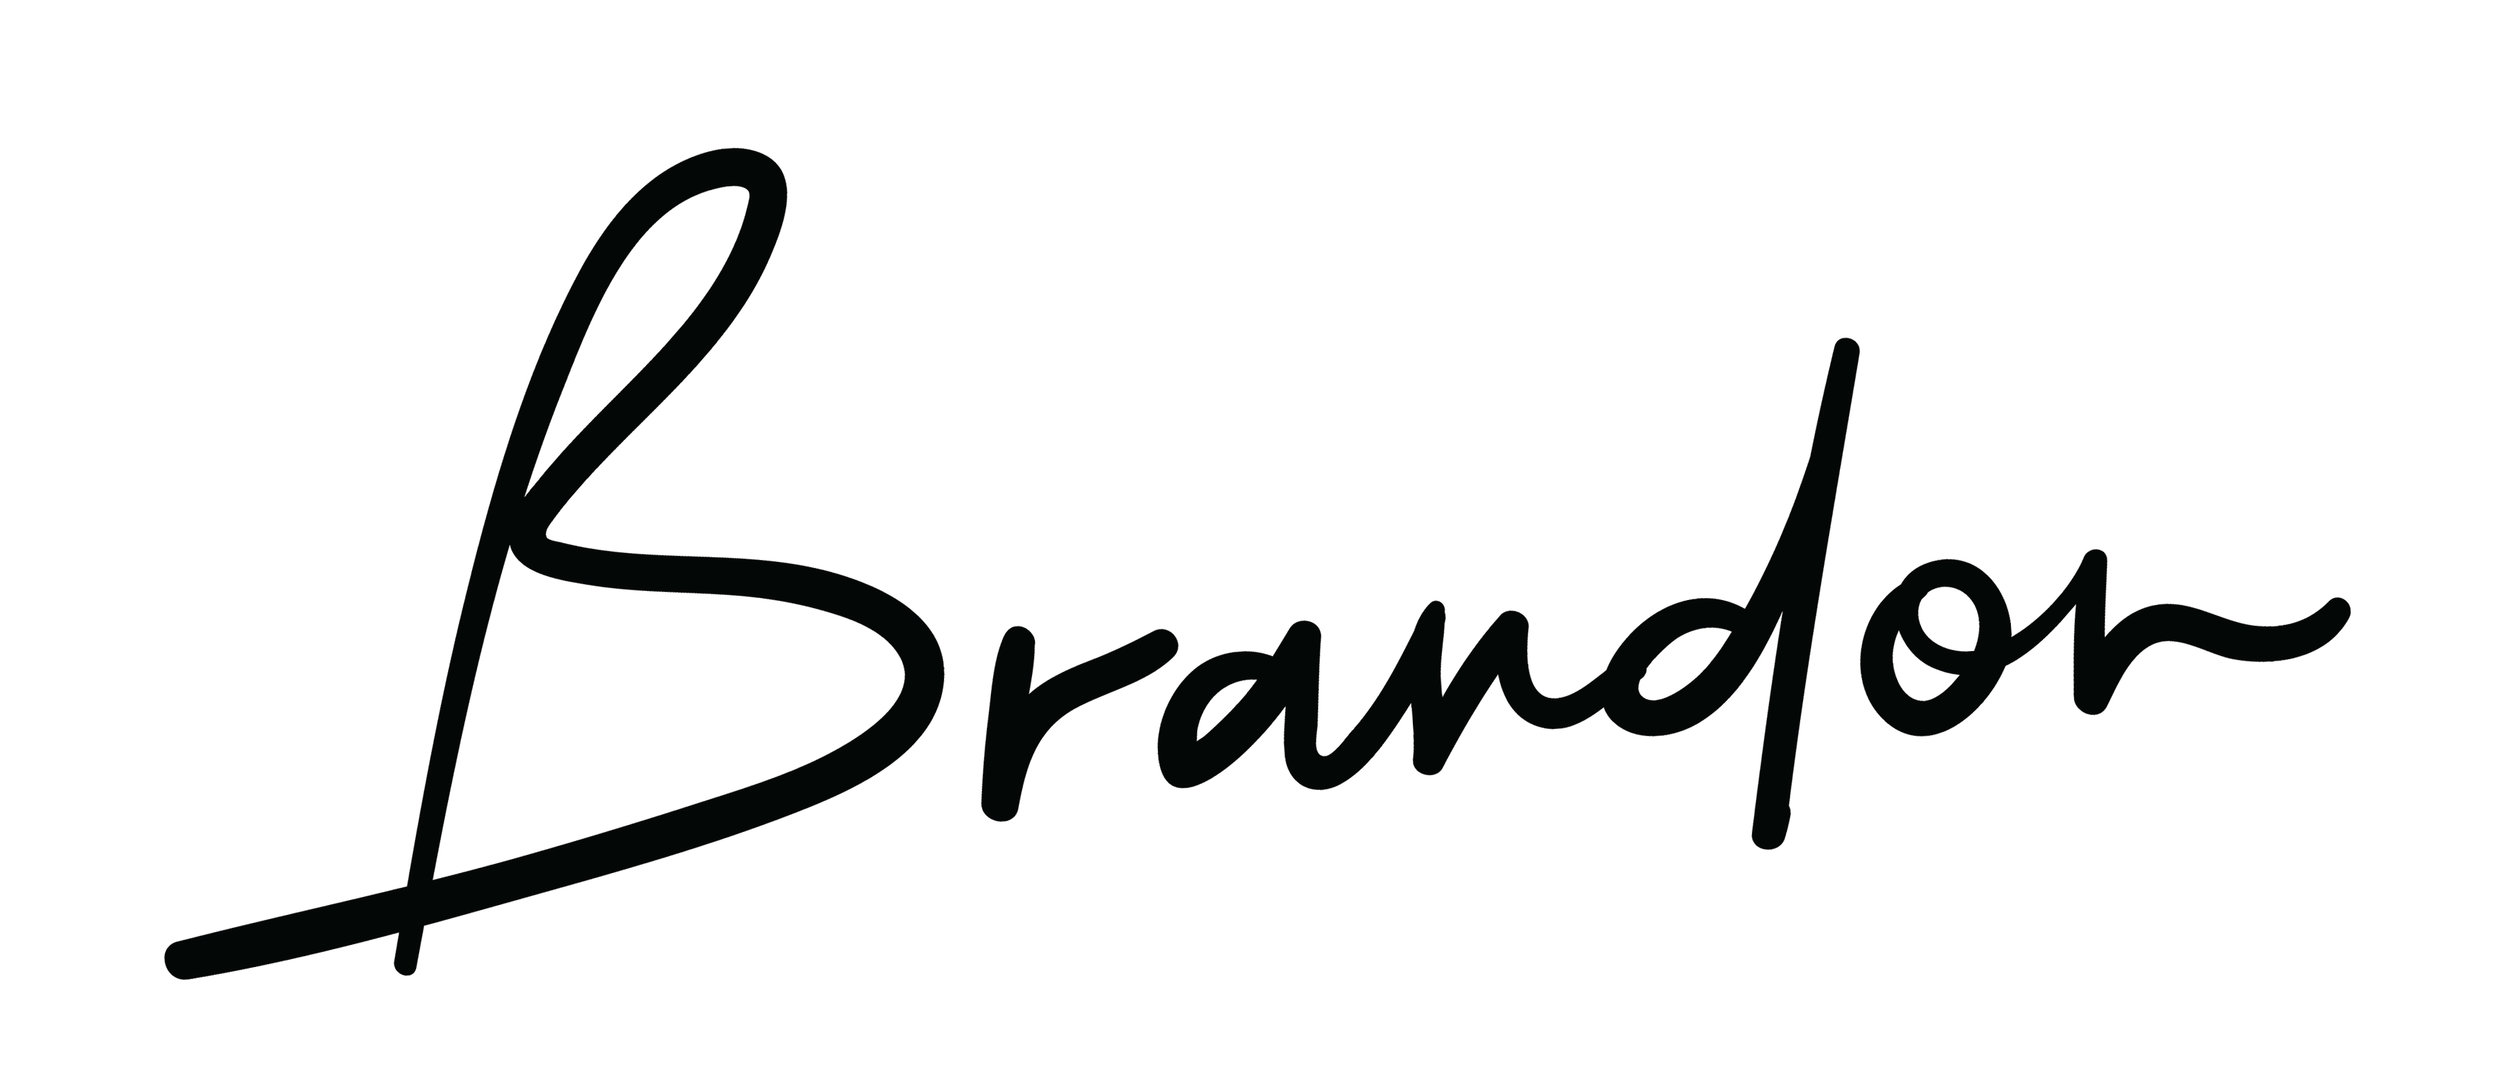 Brandon only black slant jpeg.jpg